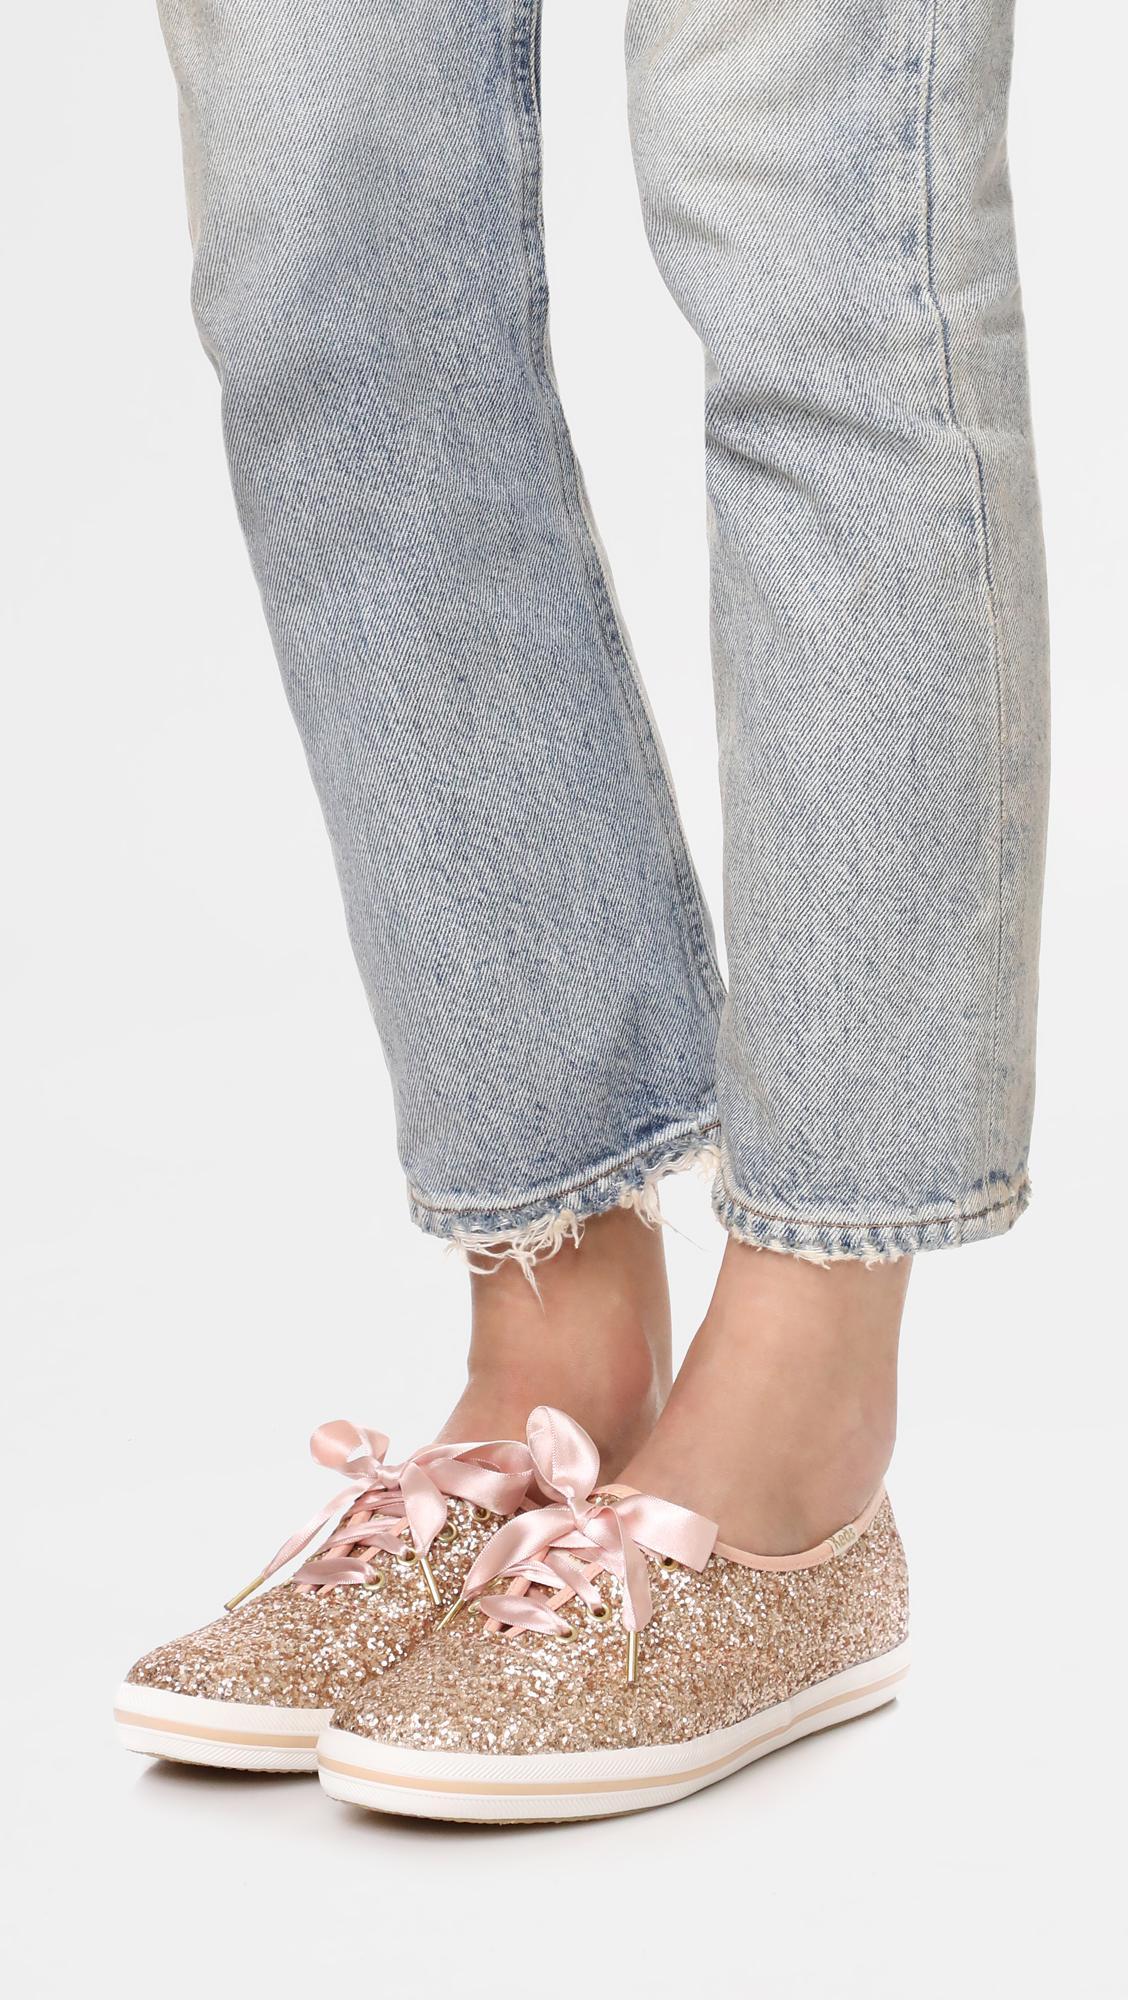 bf4f496e067d39 Keds - Pink X Kate Spade New York Glitter Sneakers - Lyst. View fullscreen